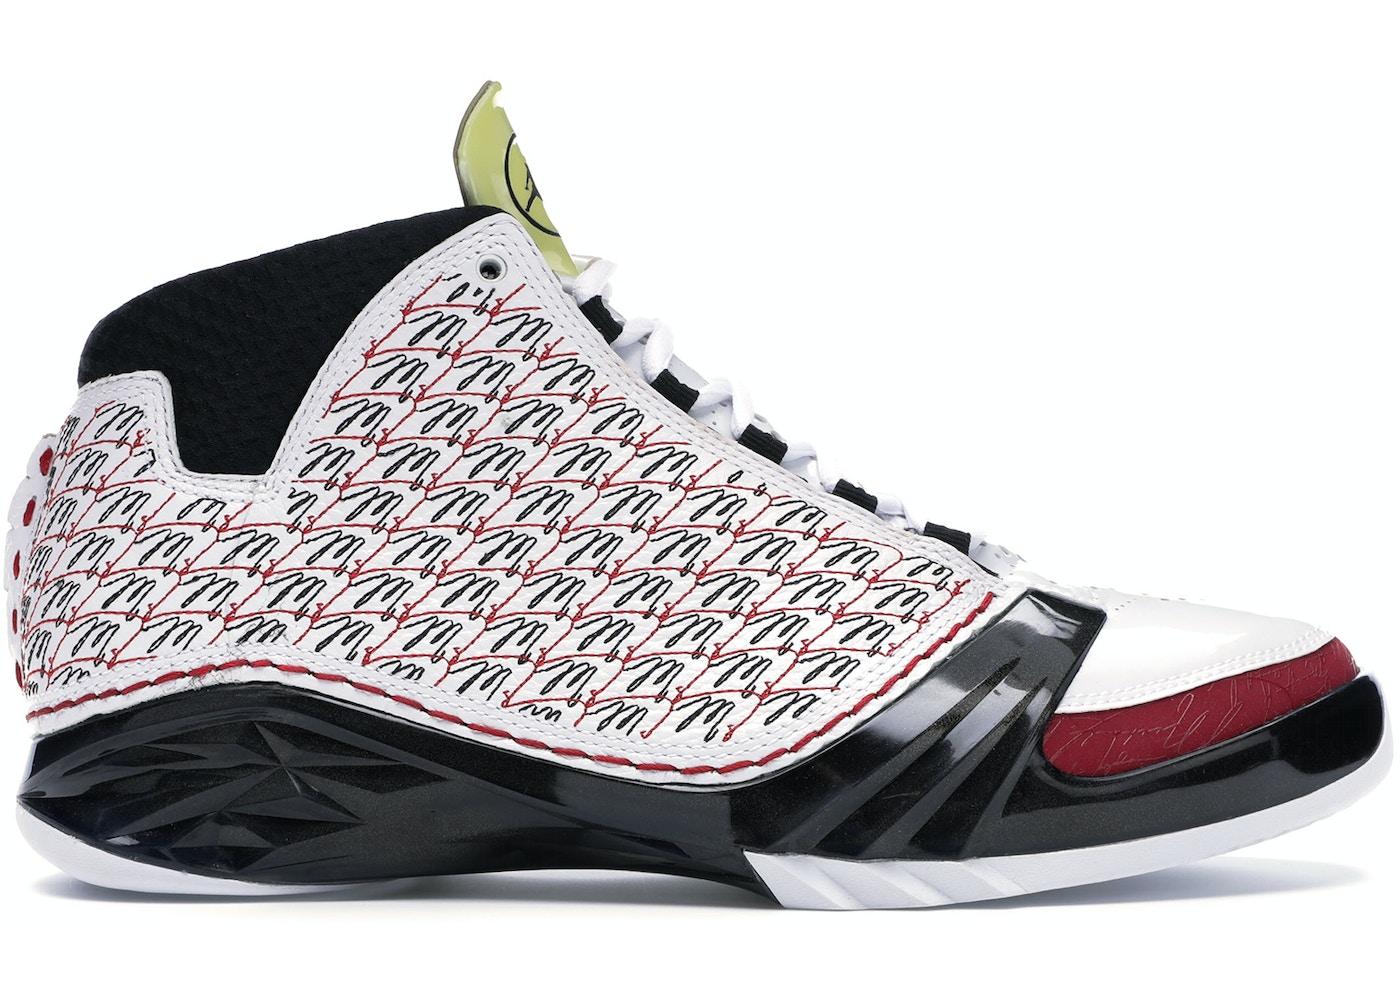 b889688dfebe71 Buy Air Jordan 23 Shoes   Deadstock Sneakers